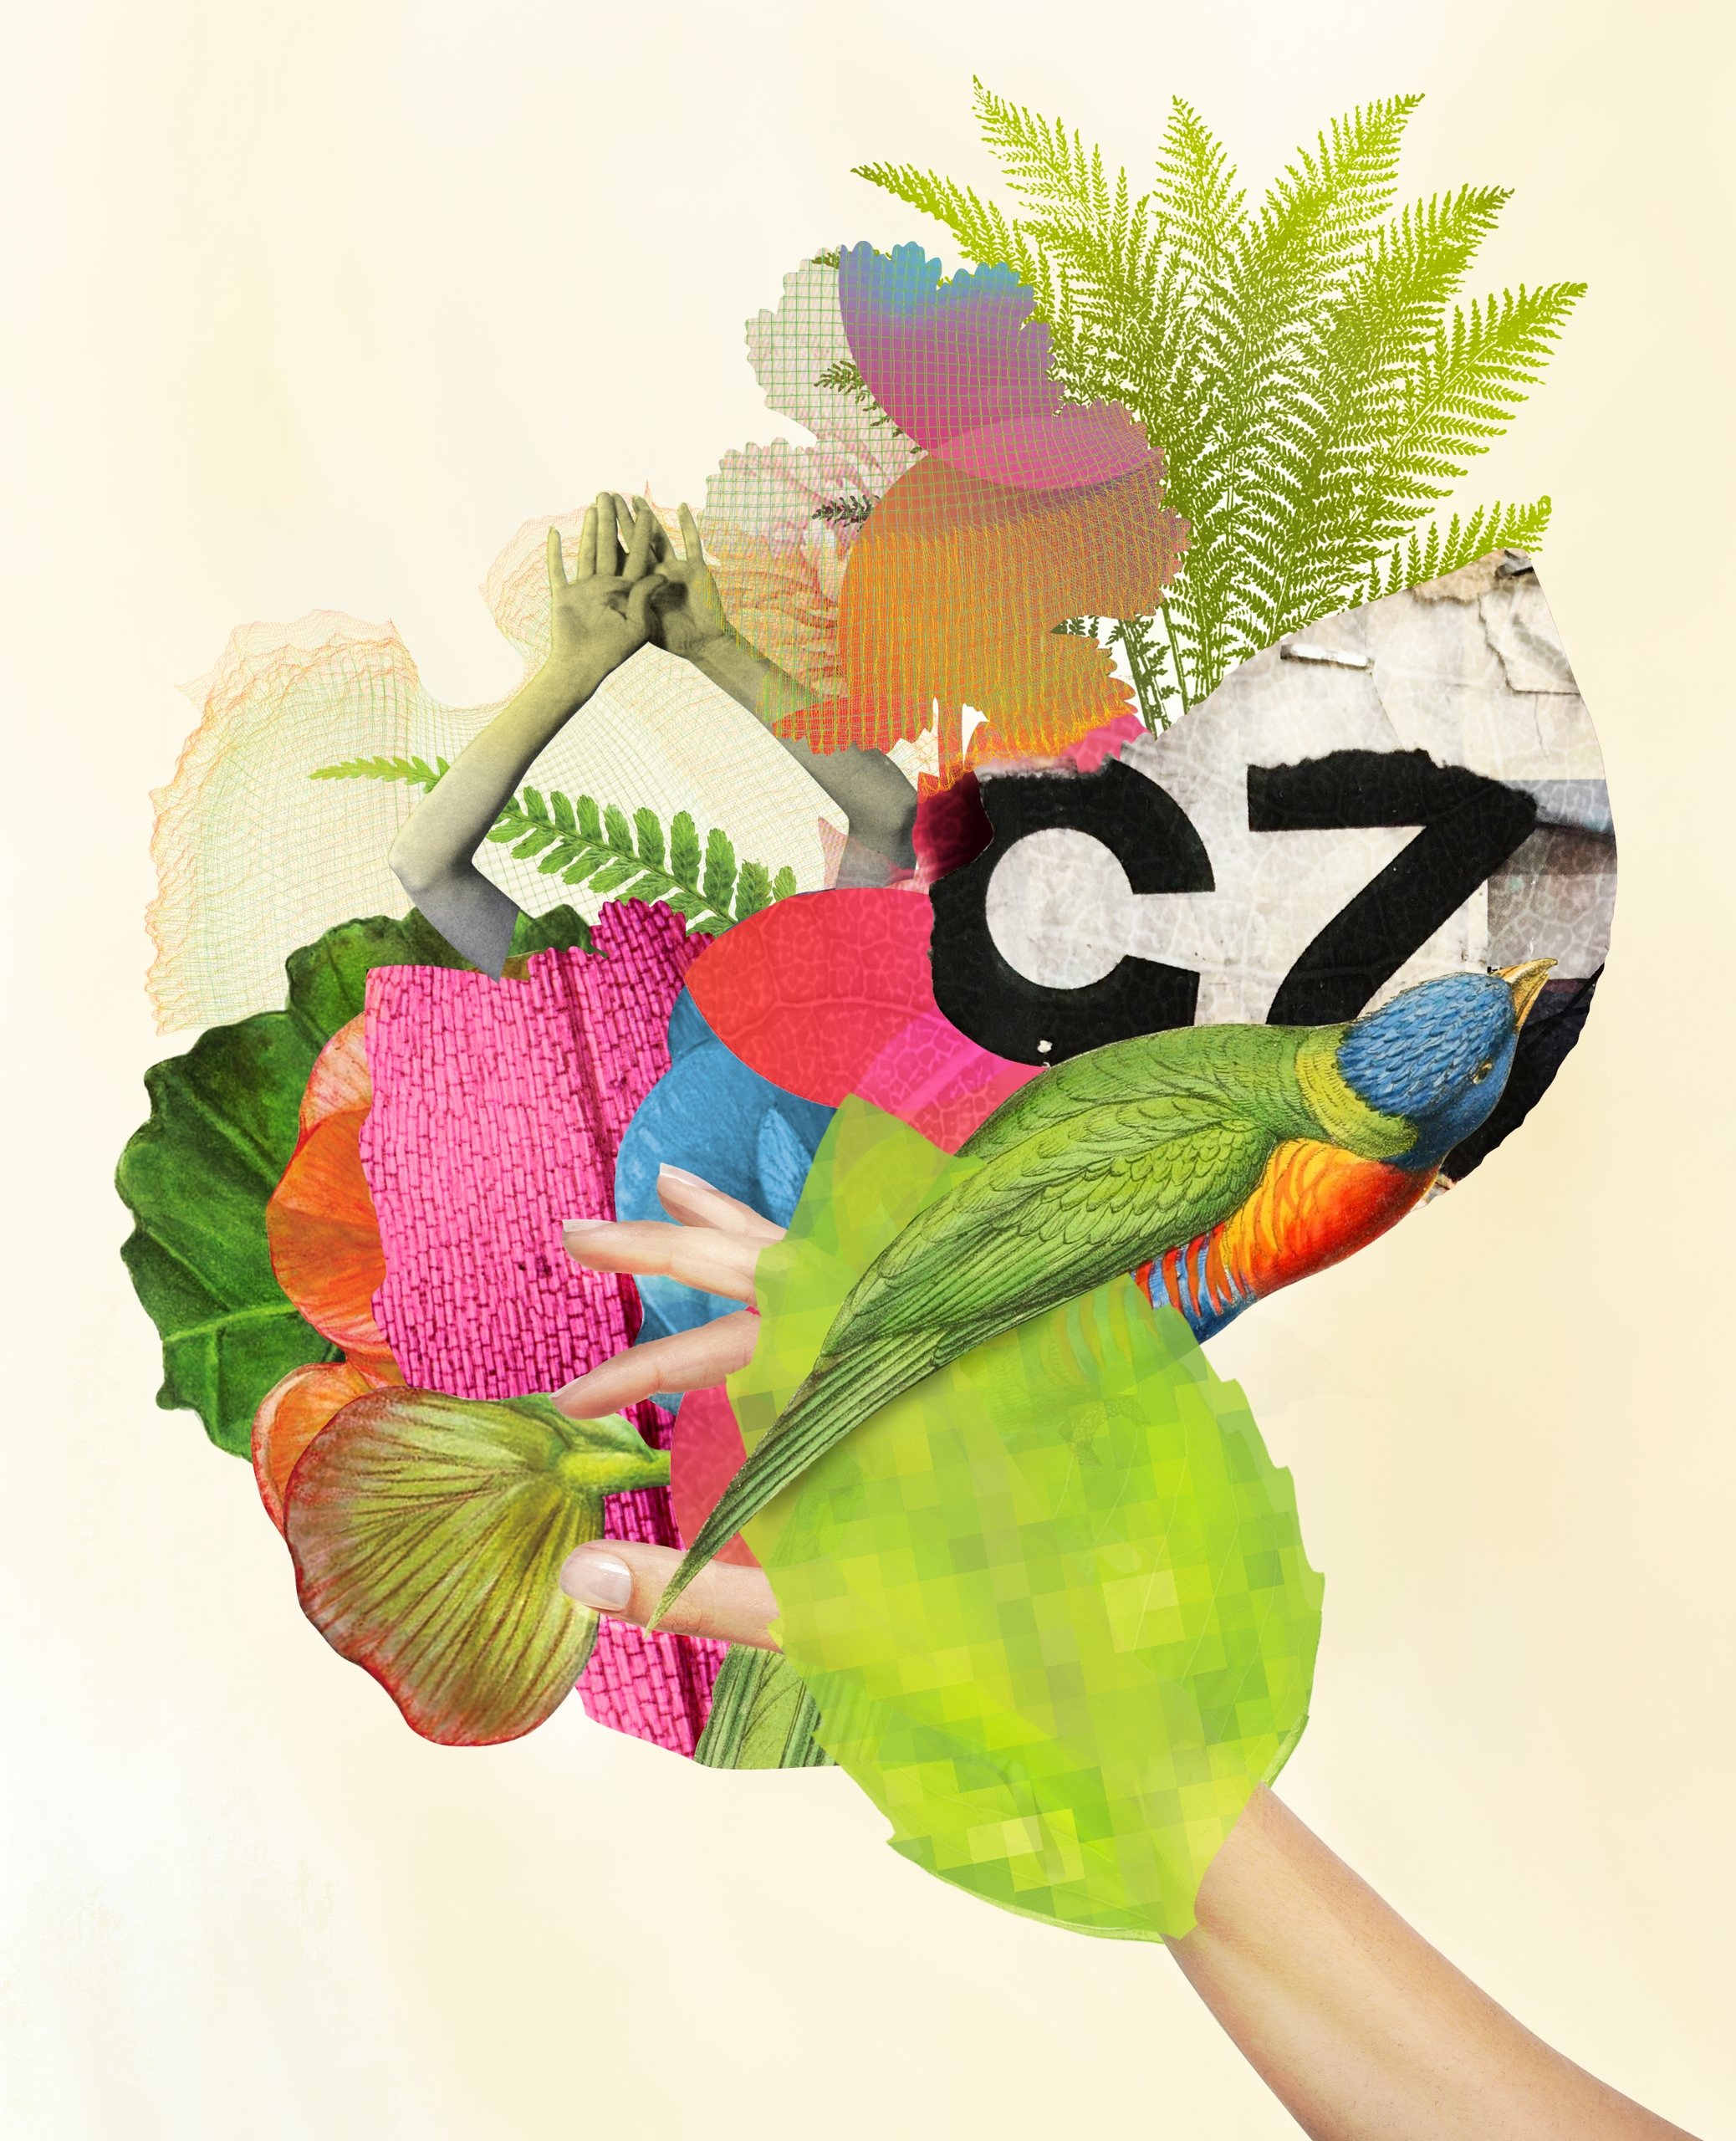 Forage 25 core nature nurture?  - craigcloutier | ello